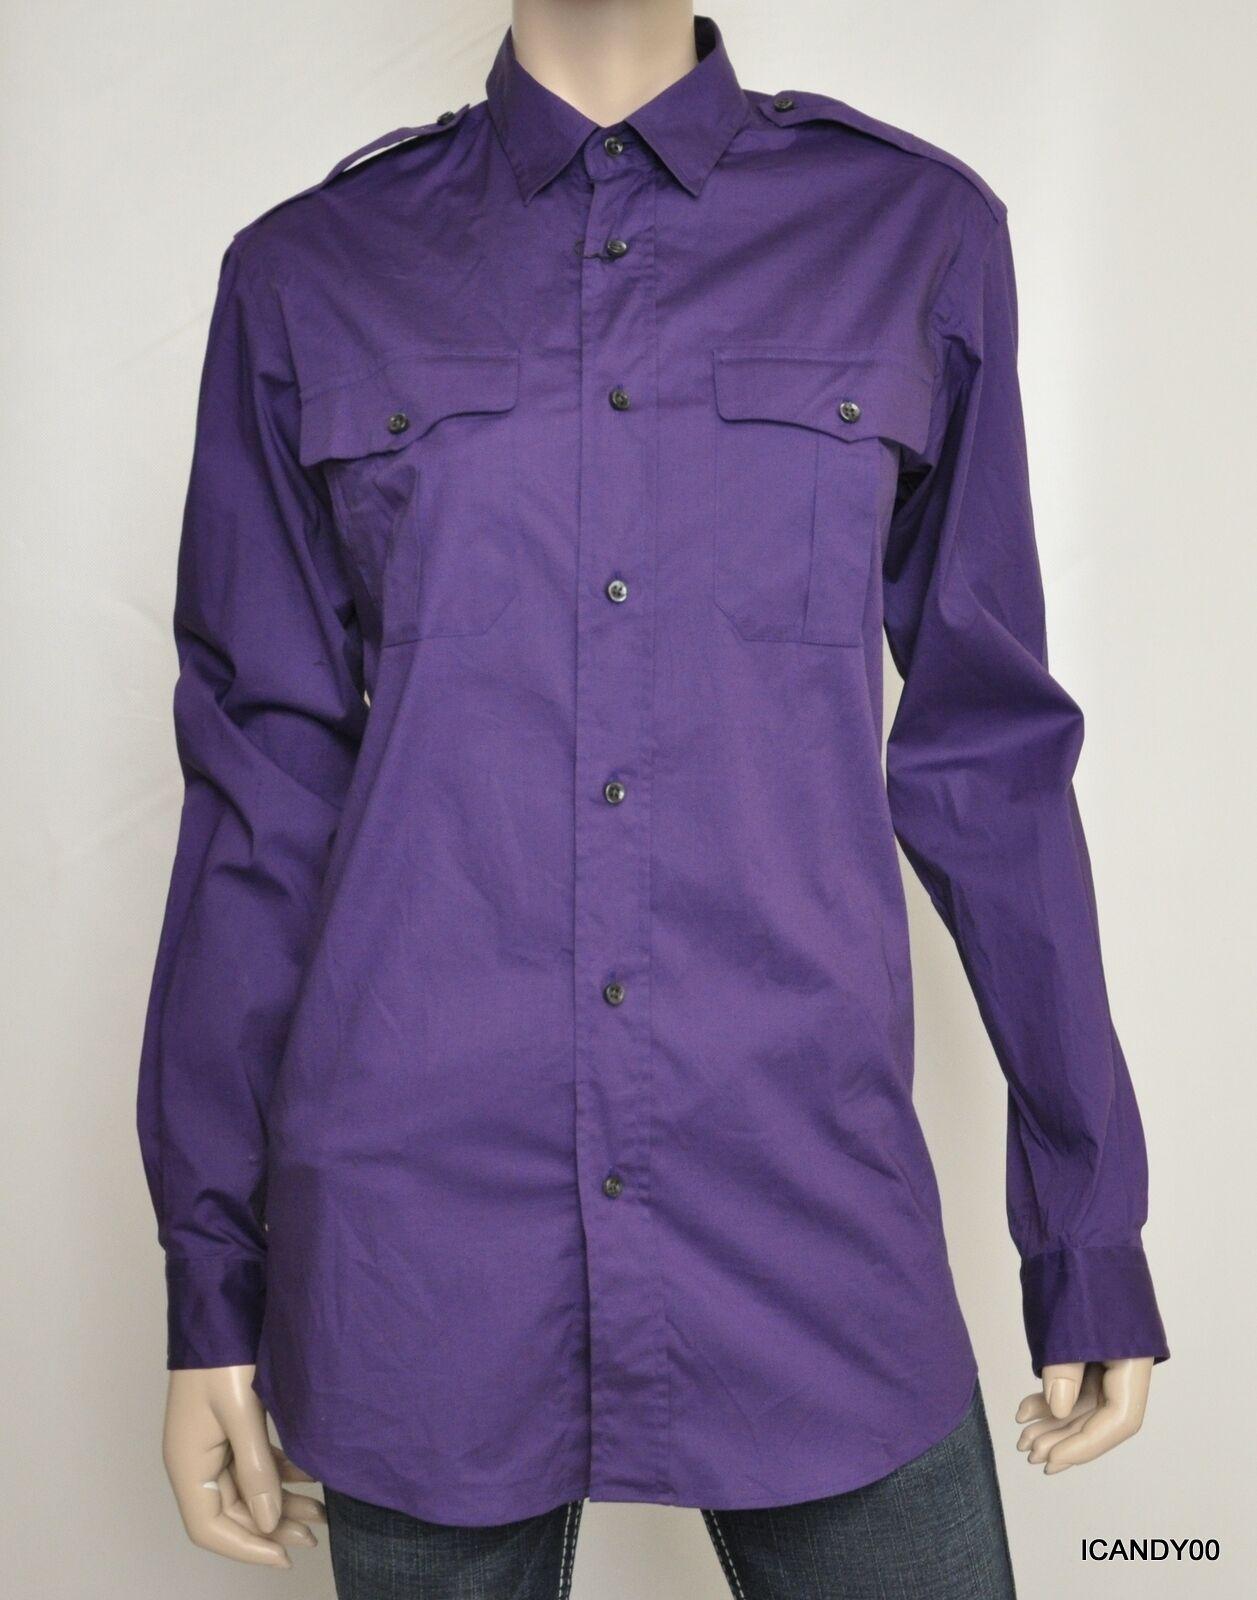 Nwt  RALPH LAUREN schwarz Label  Button Down Shirt Blouse lila S